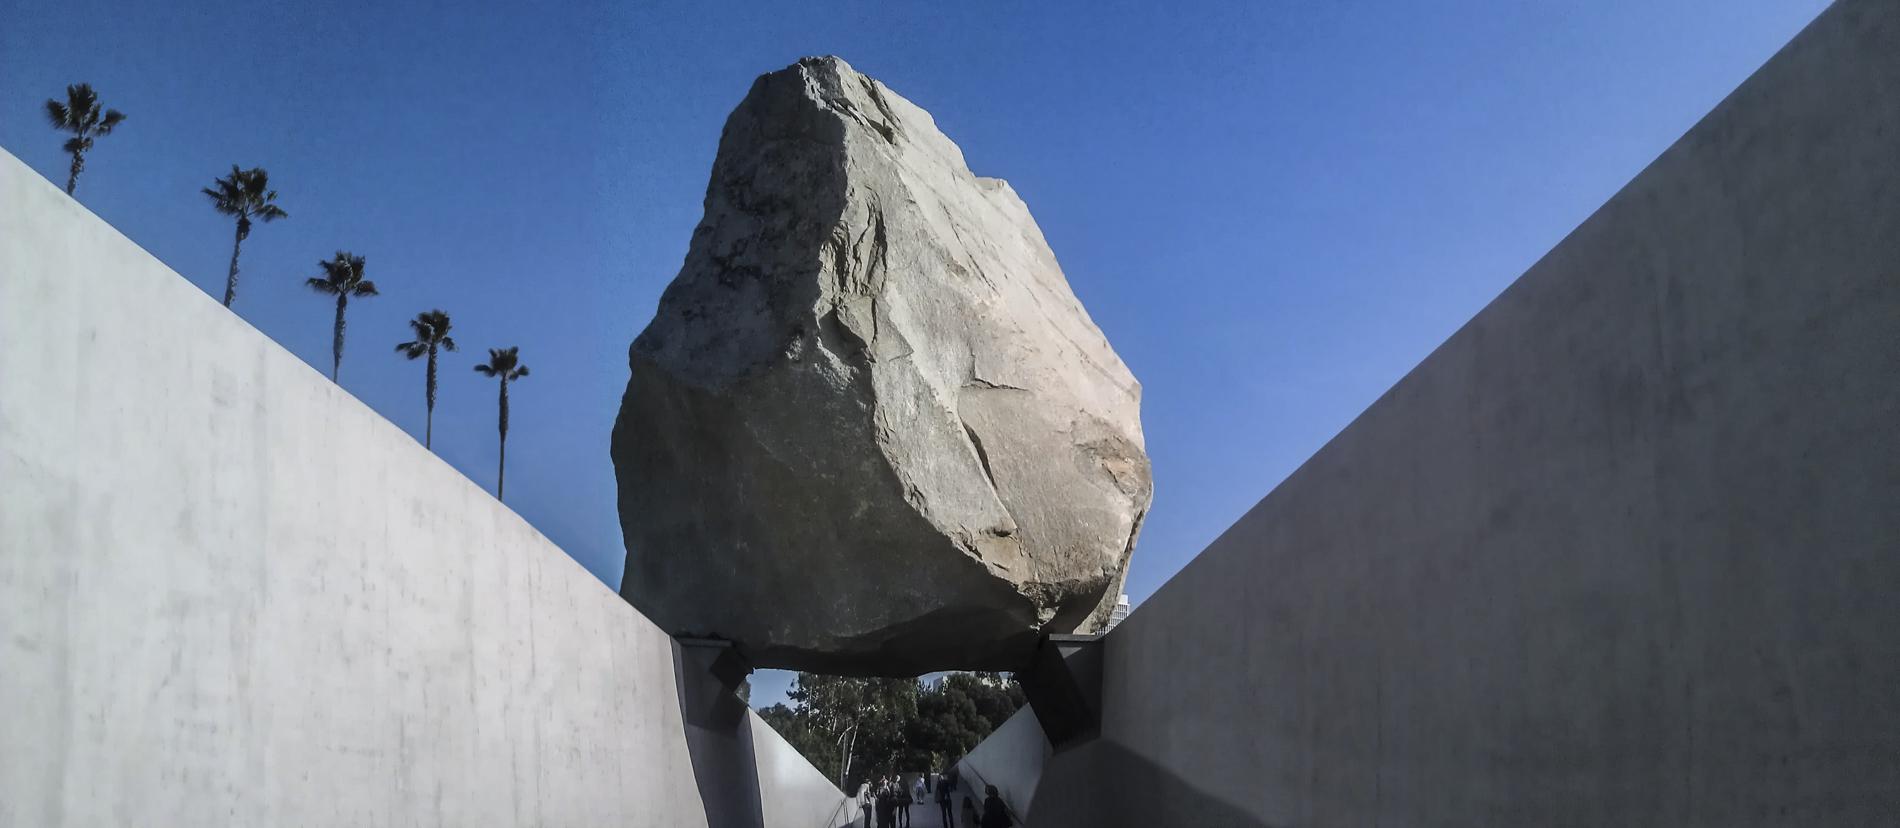 Levitated Rock LACMABruce Burr - 1900x72